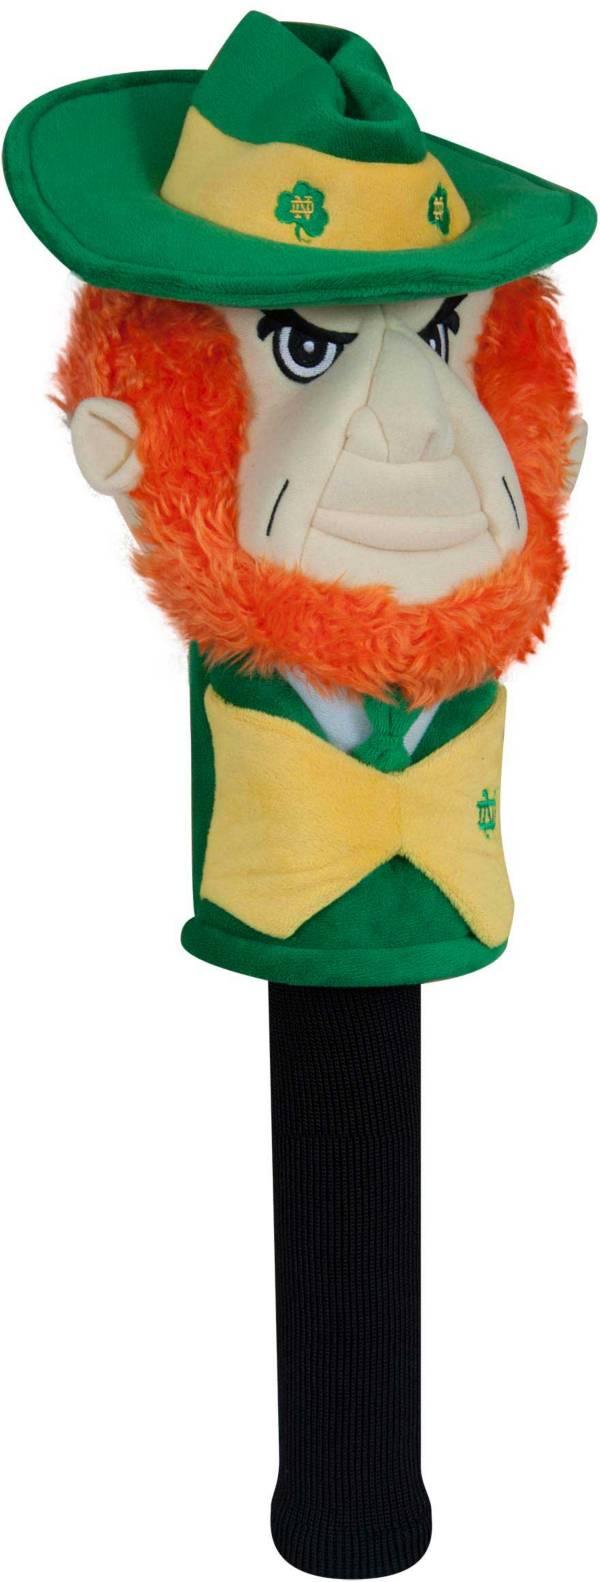 Team Effort Notre Dame Fighting Irish Mascot Headcover product image